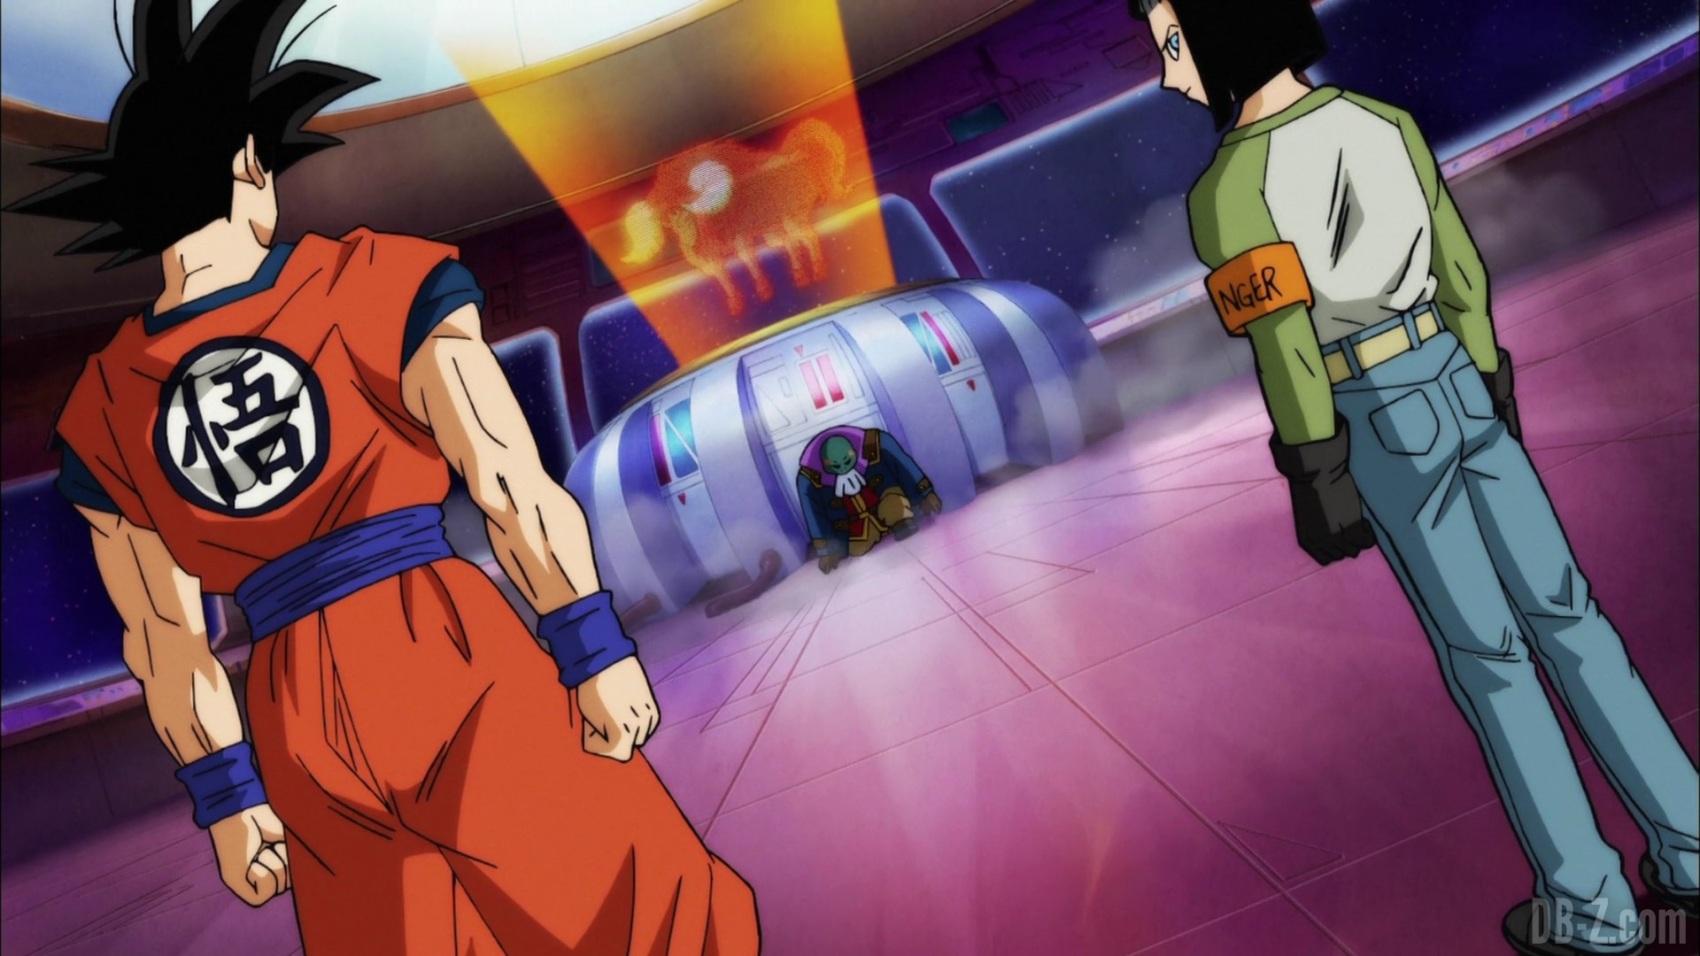 Dragon-Ball-Super-Episode-87-image47